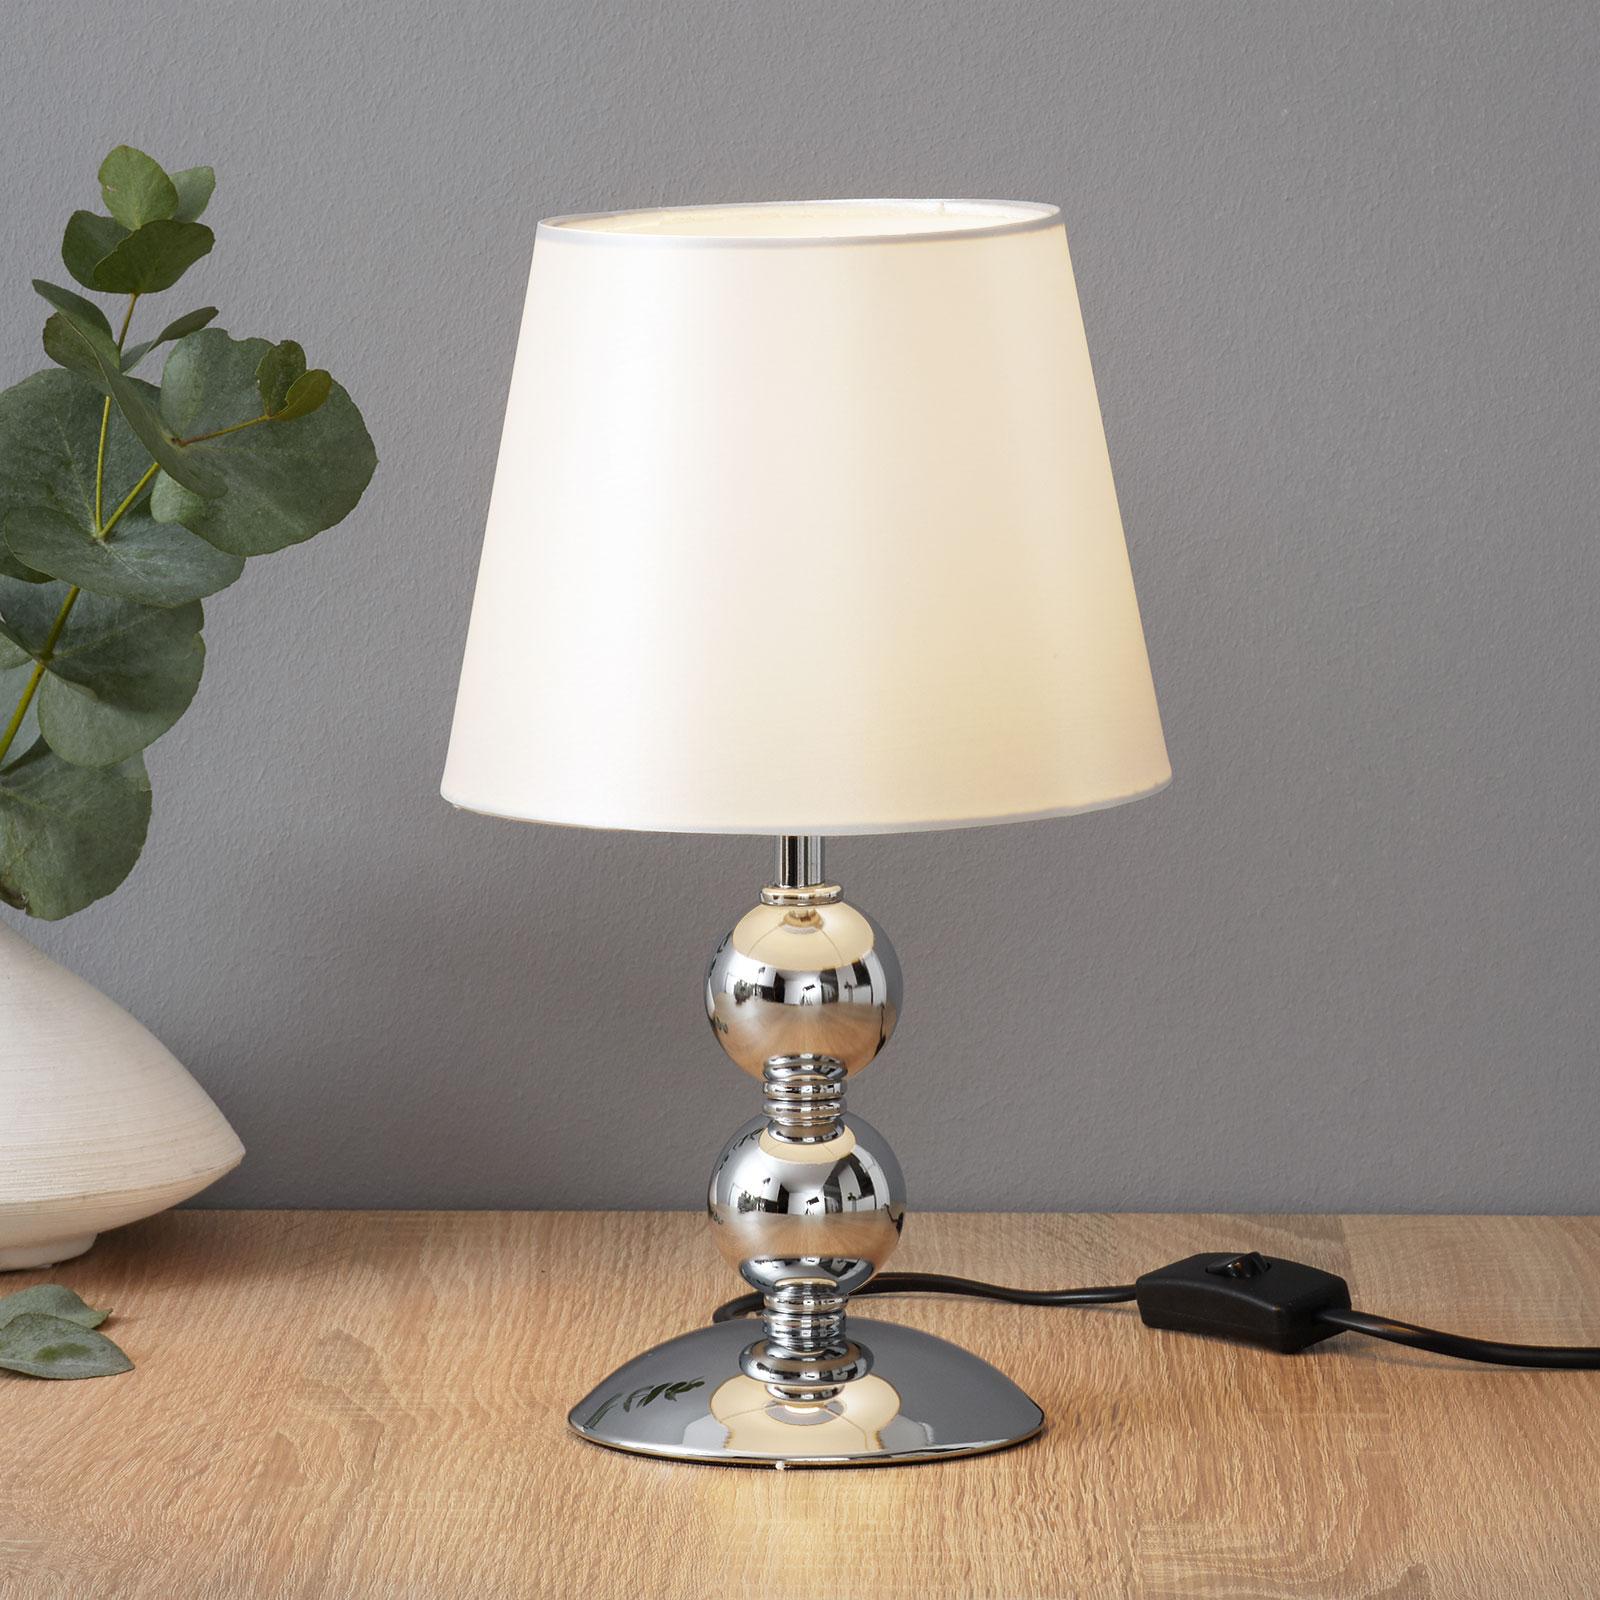 Lampada da tavolo Bea cromata